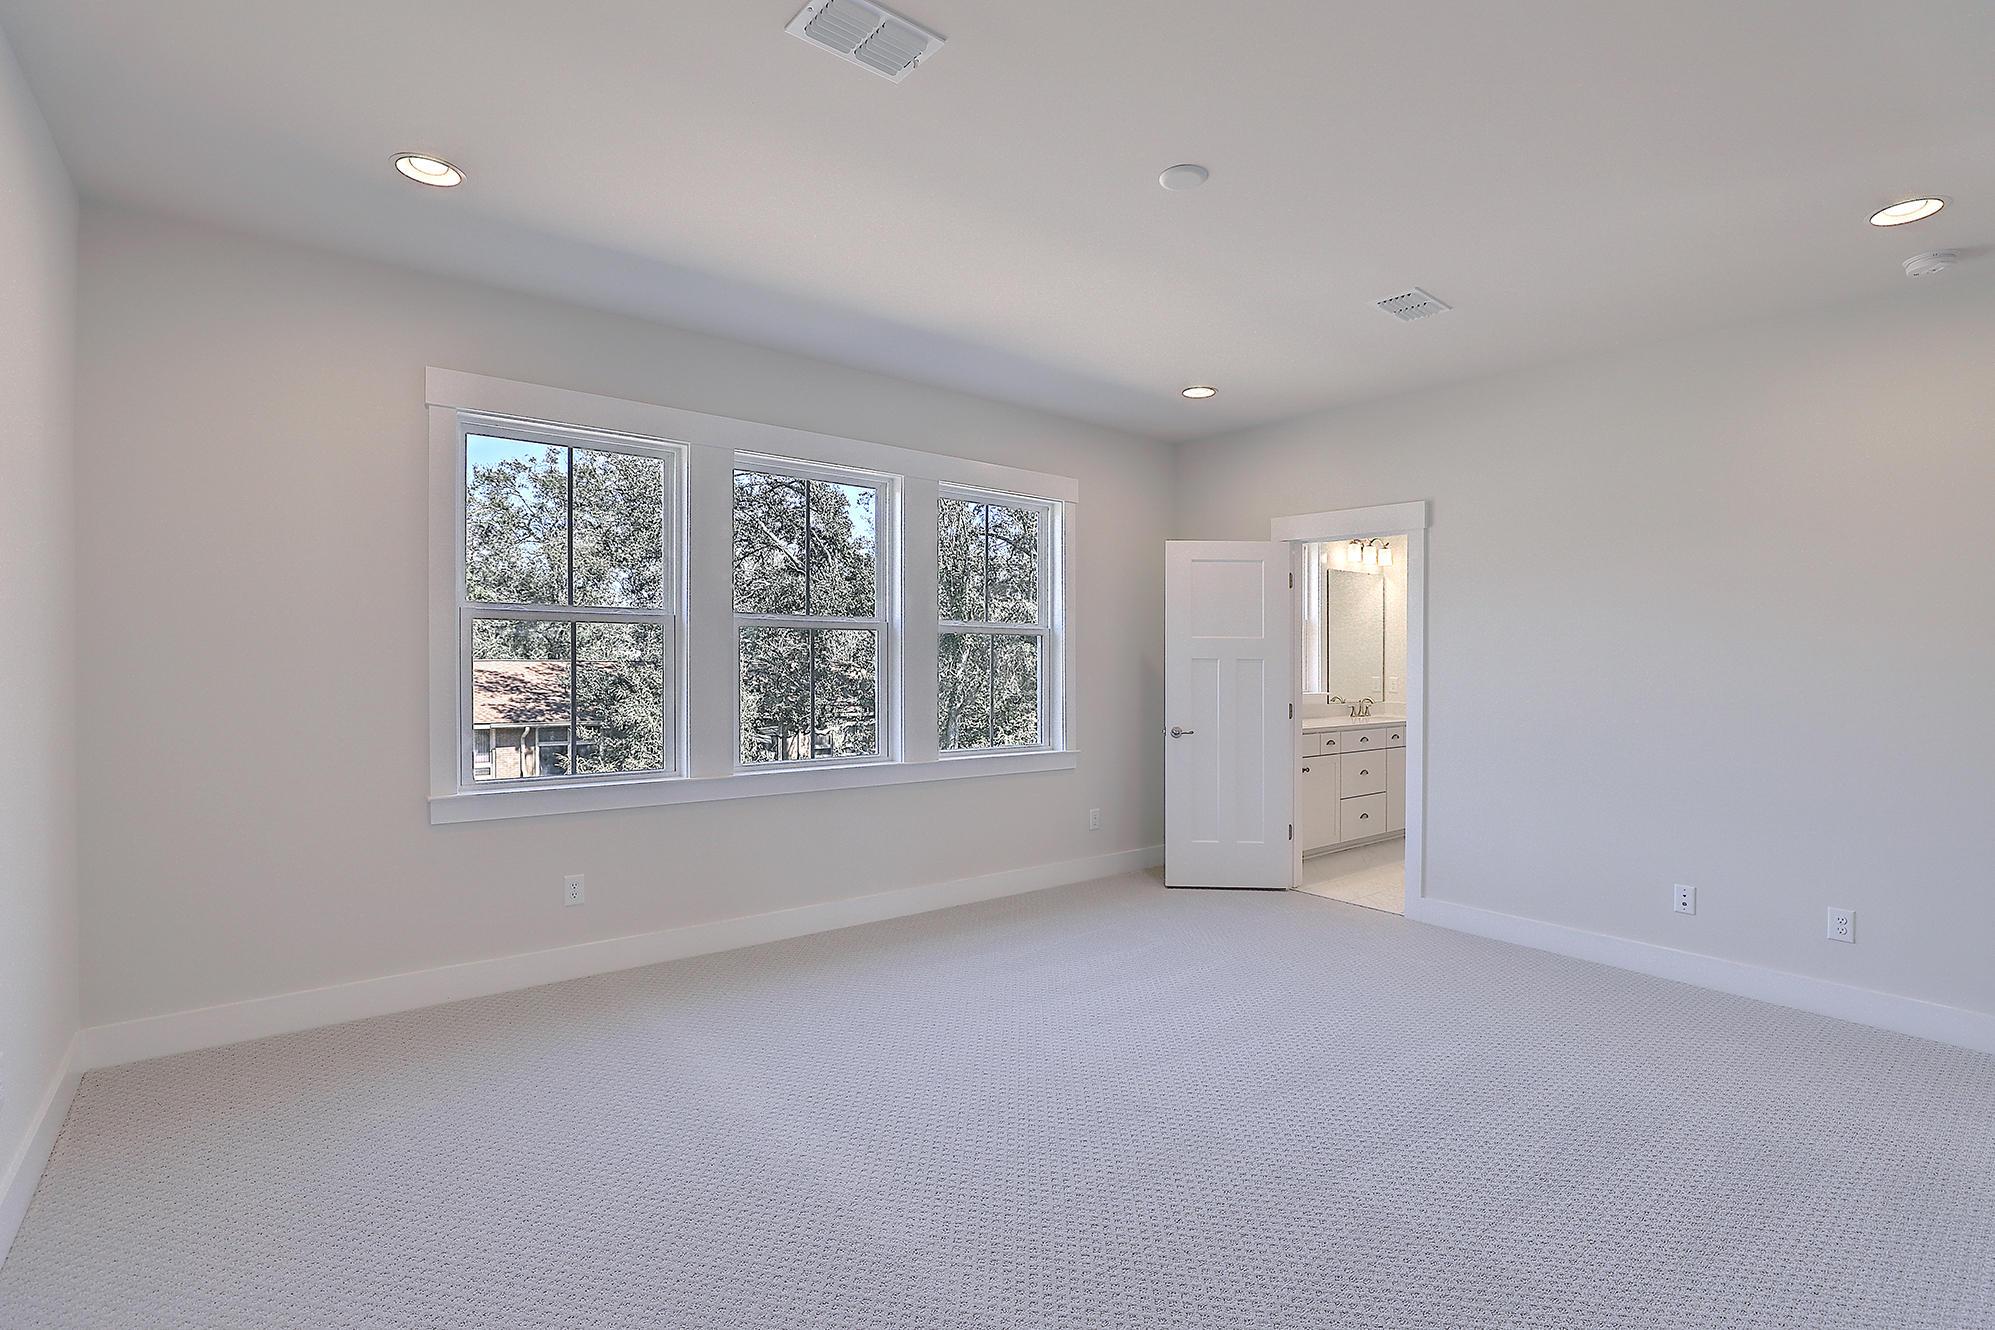 Bentley Park Homes For Sale - 1218 Gannett, Mount Pleasant, SC - 28